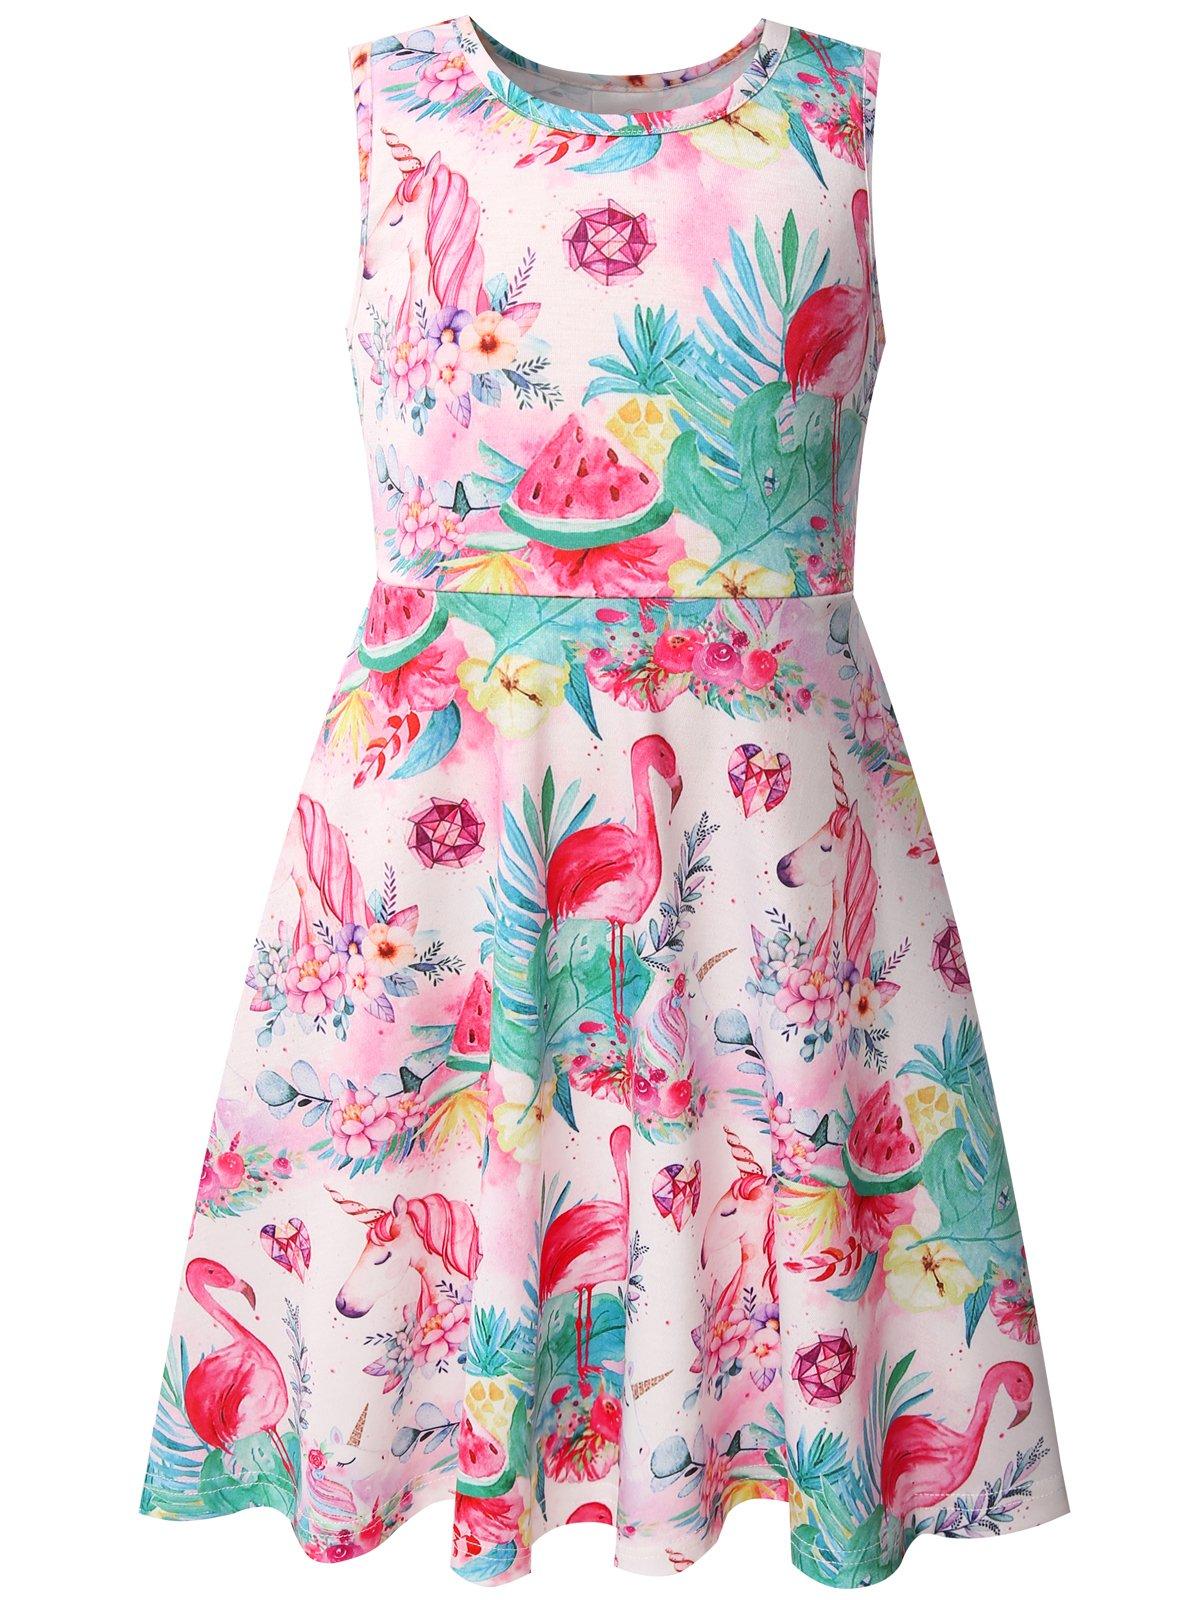 Bonny Billy Girls' Summer Flamingo Cotton Tanks Dress for Children Size 5-6 Pink